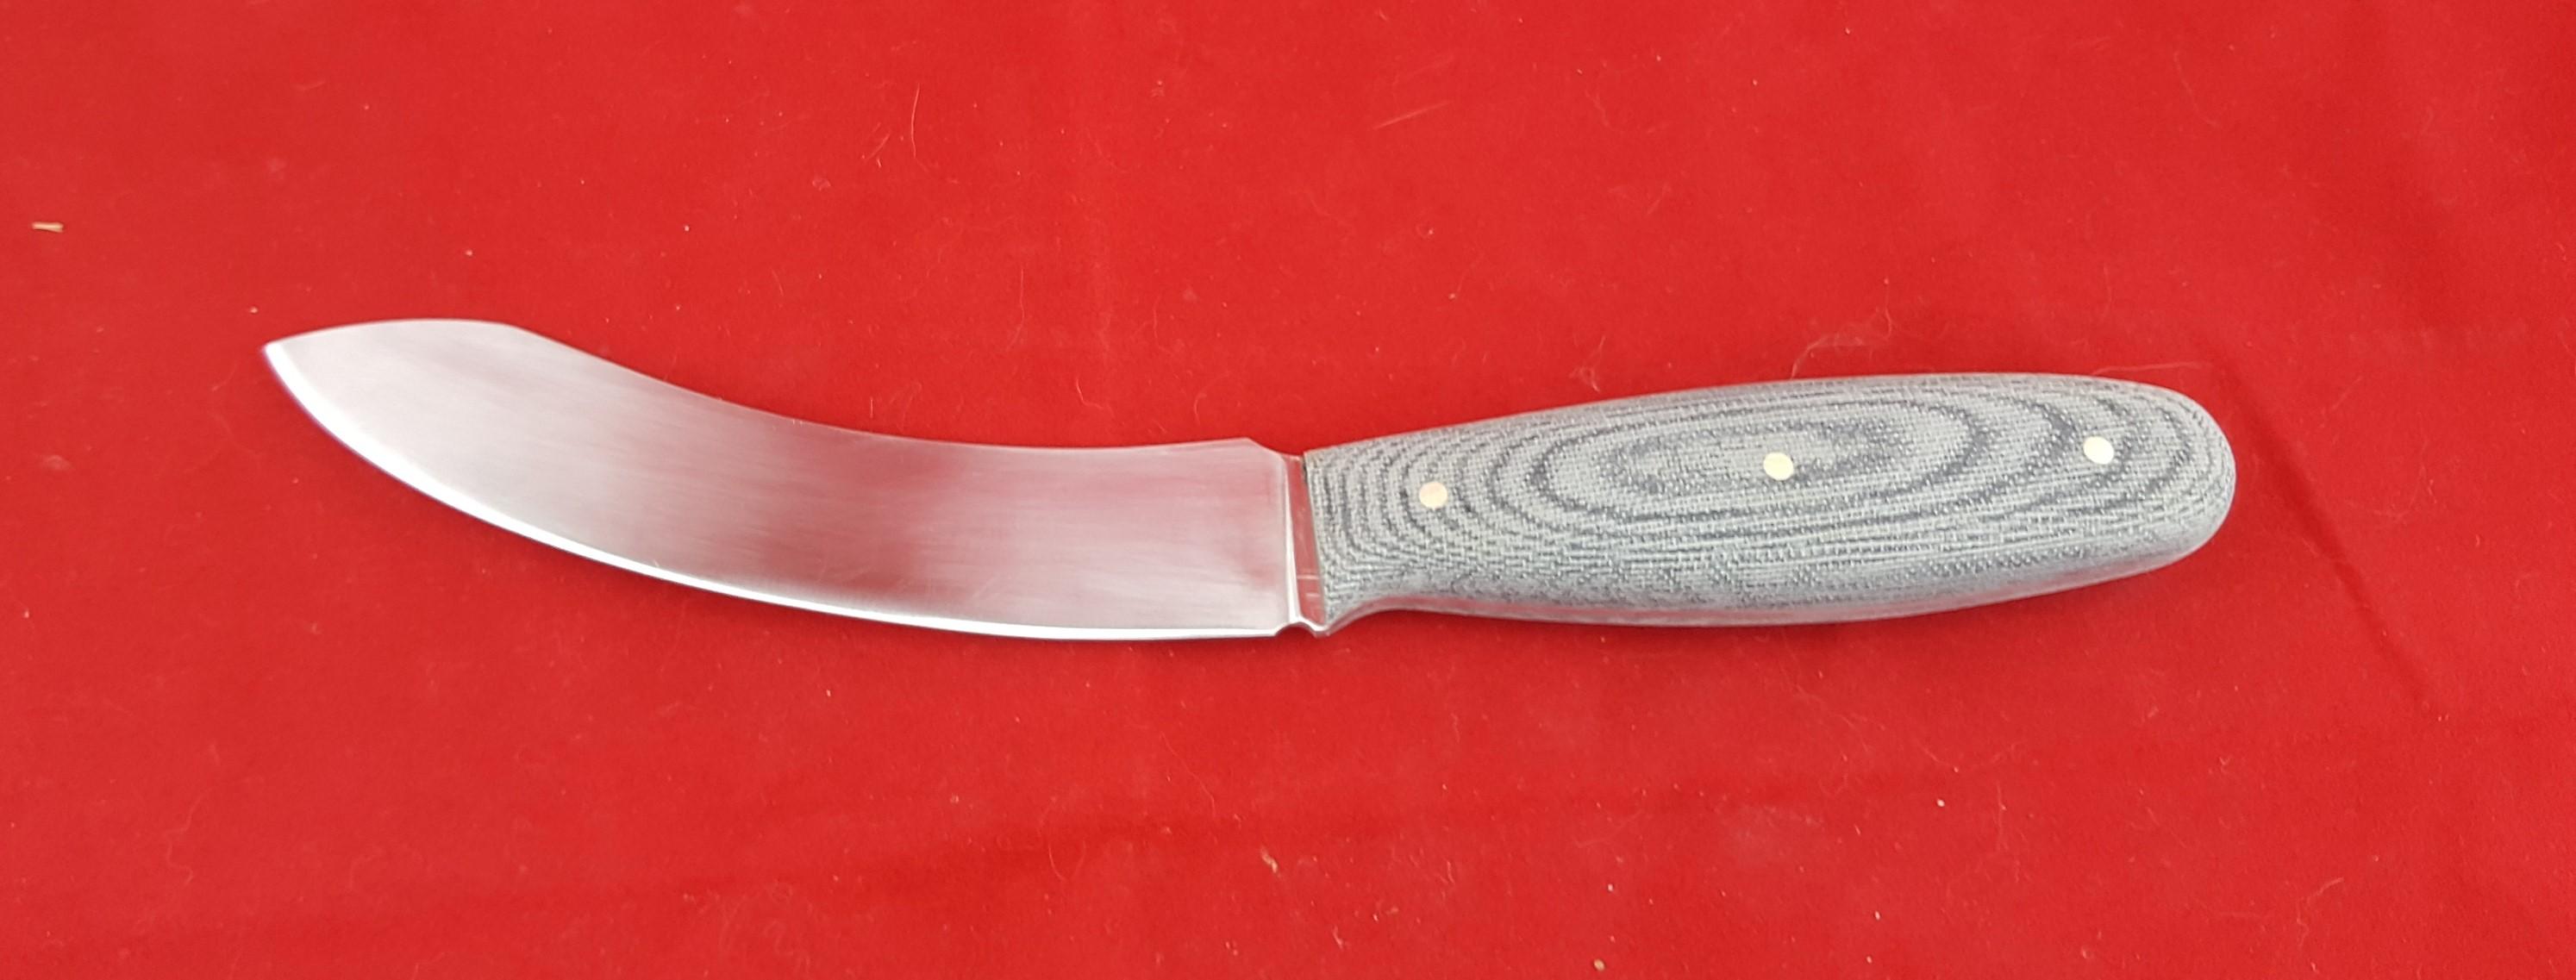 Hardcore Skinner 260 mm OL 1084 blade Canvas Micarta Handle. Made to order